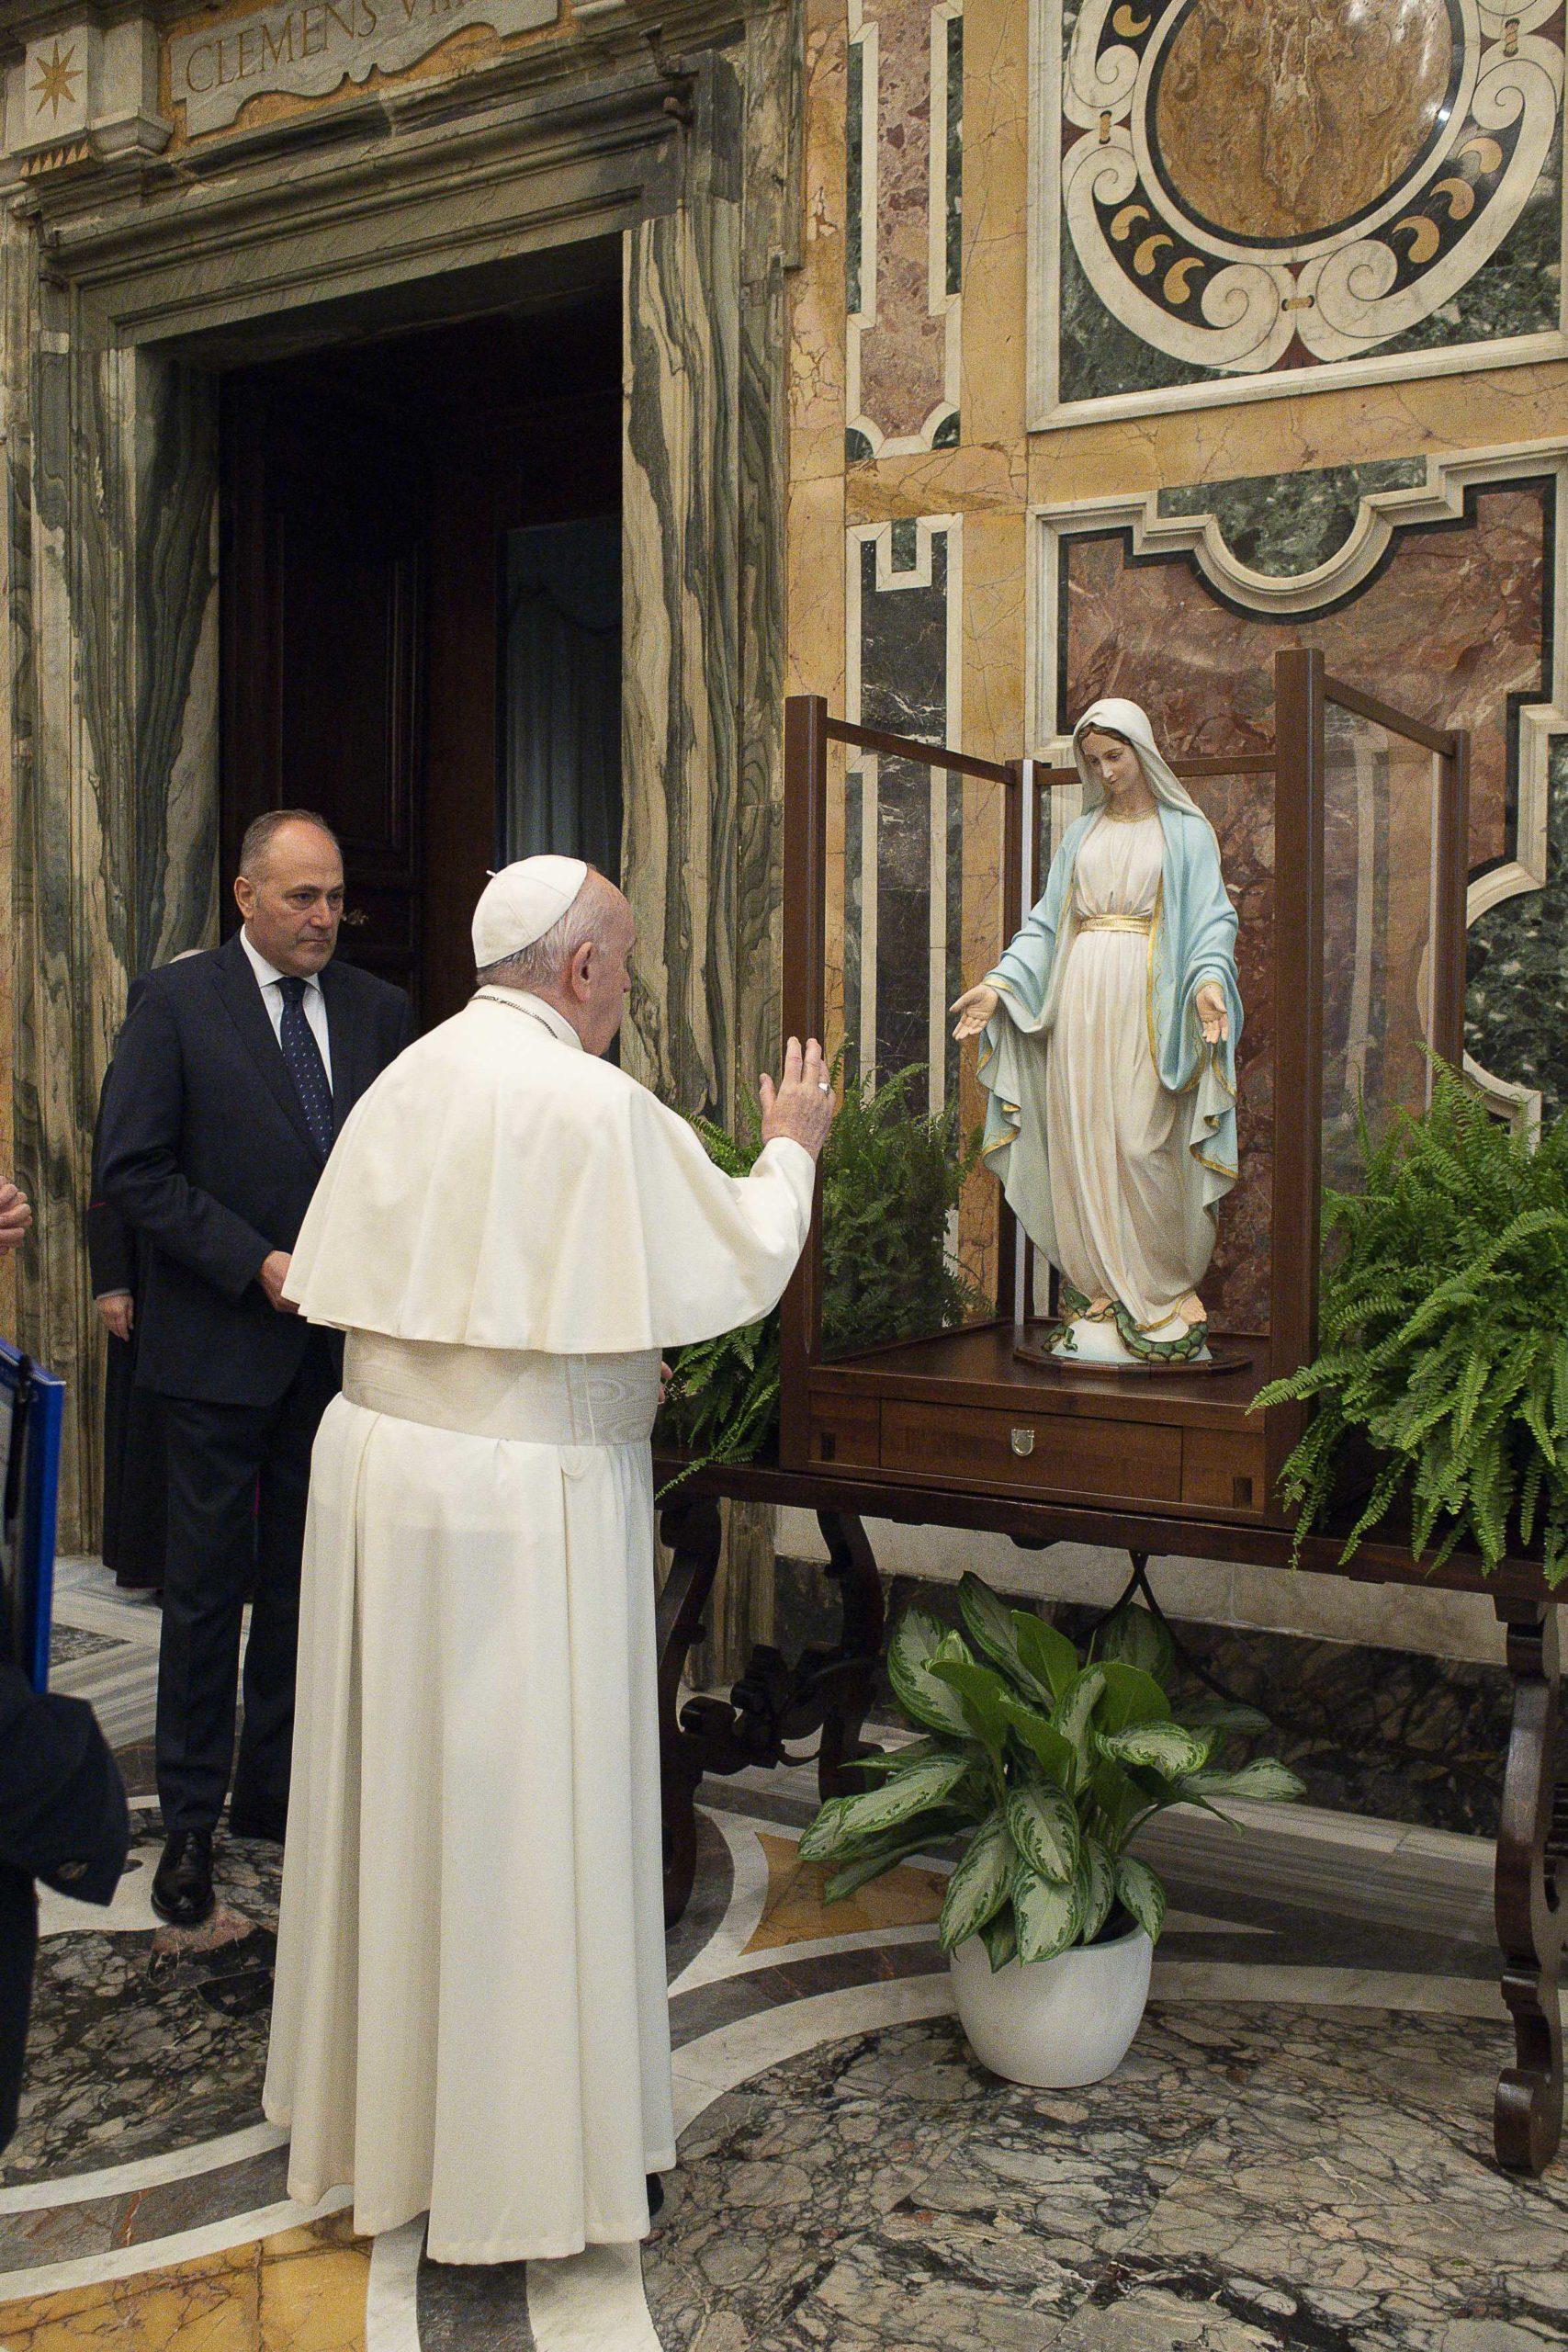 Bénédiction de la statue de la Médaille miraculeuse, 11 nov. 2020 ©Vatican Media